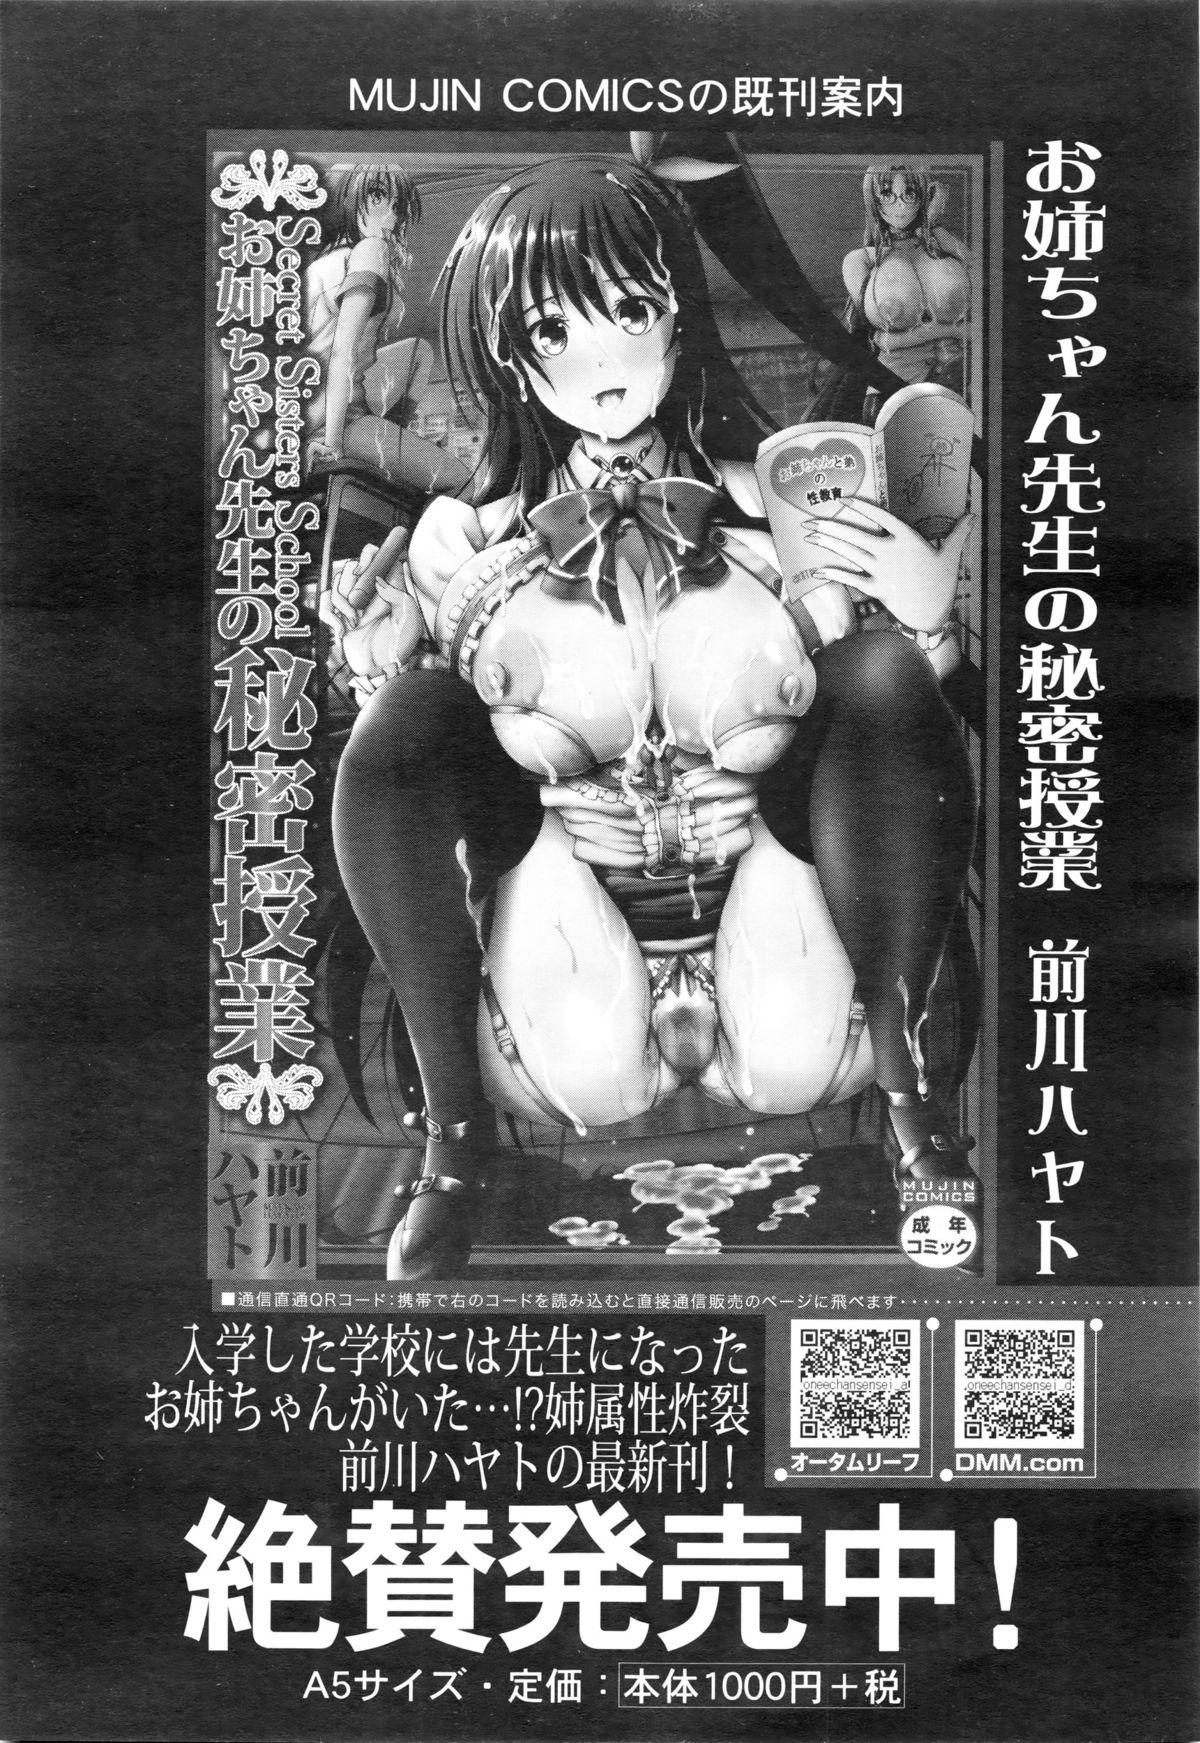 COMIC Mugen Tensei 2016-01 460